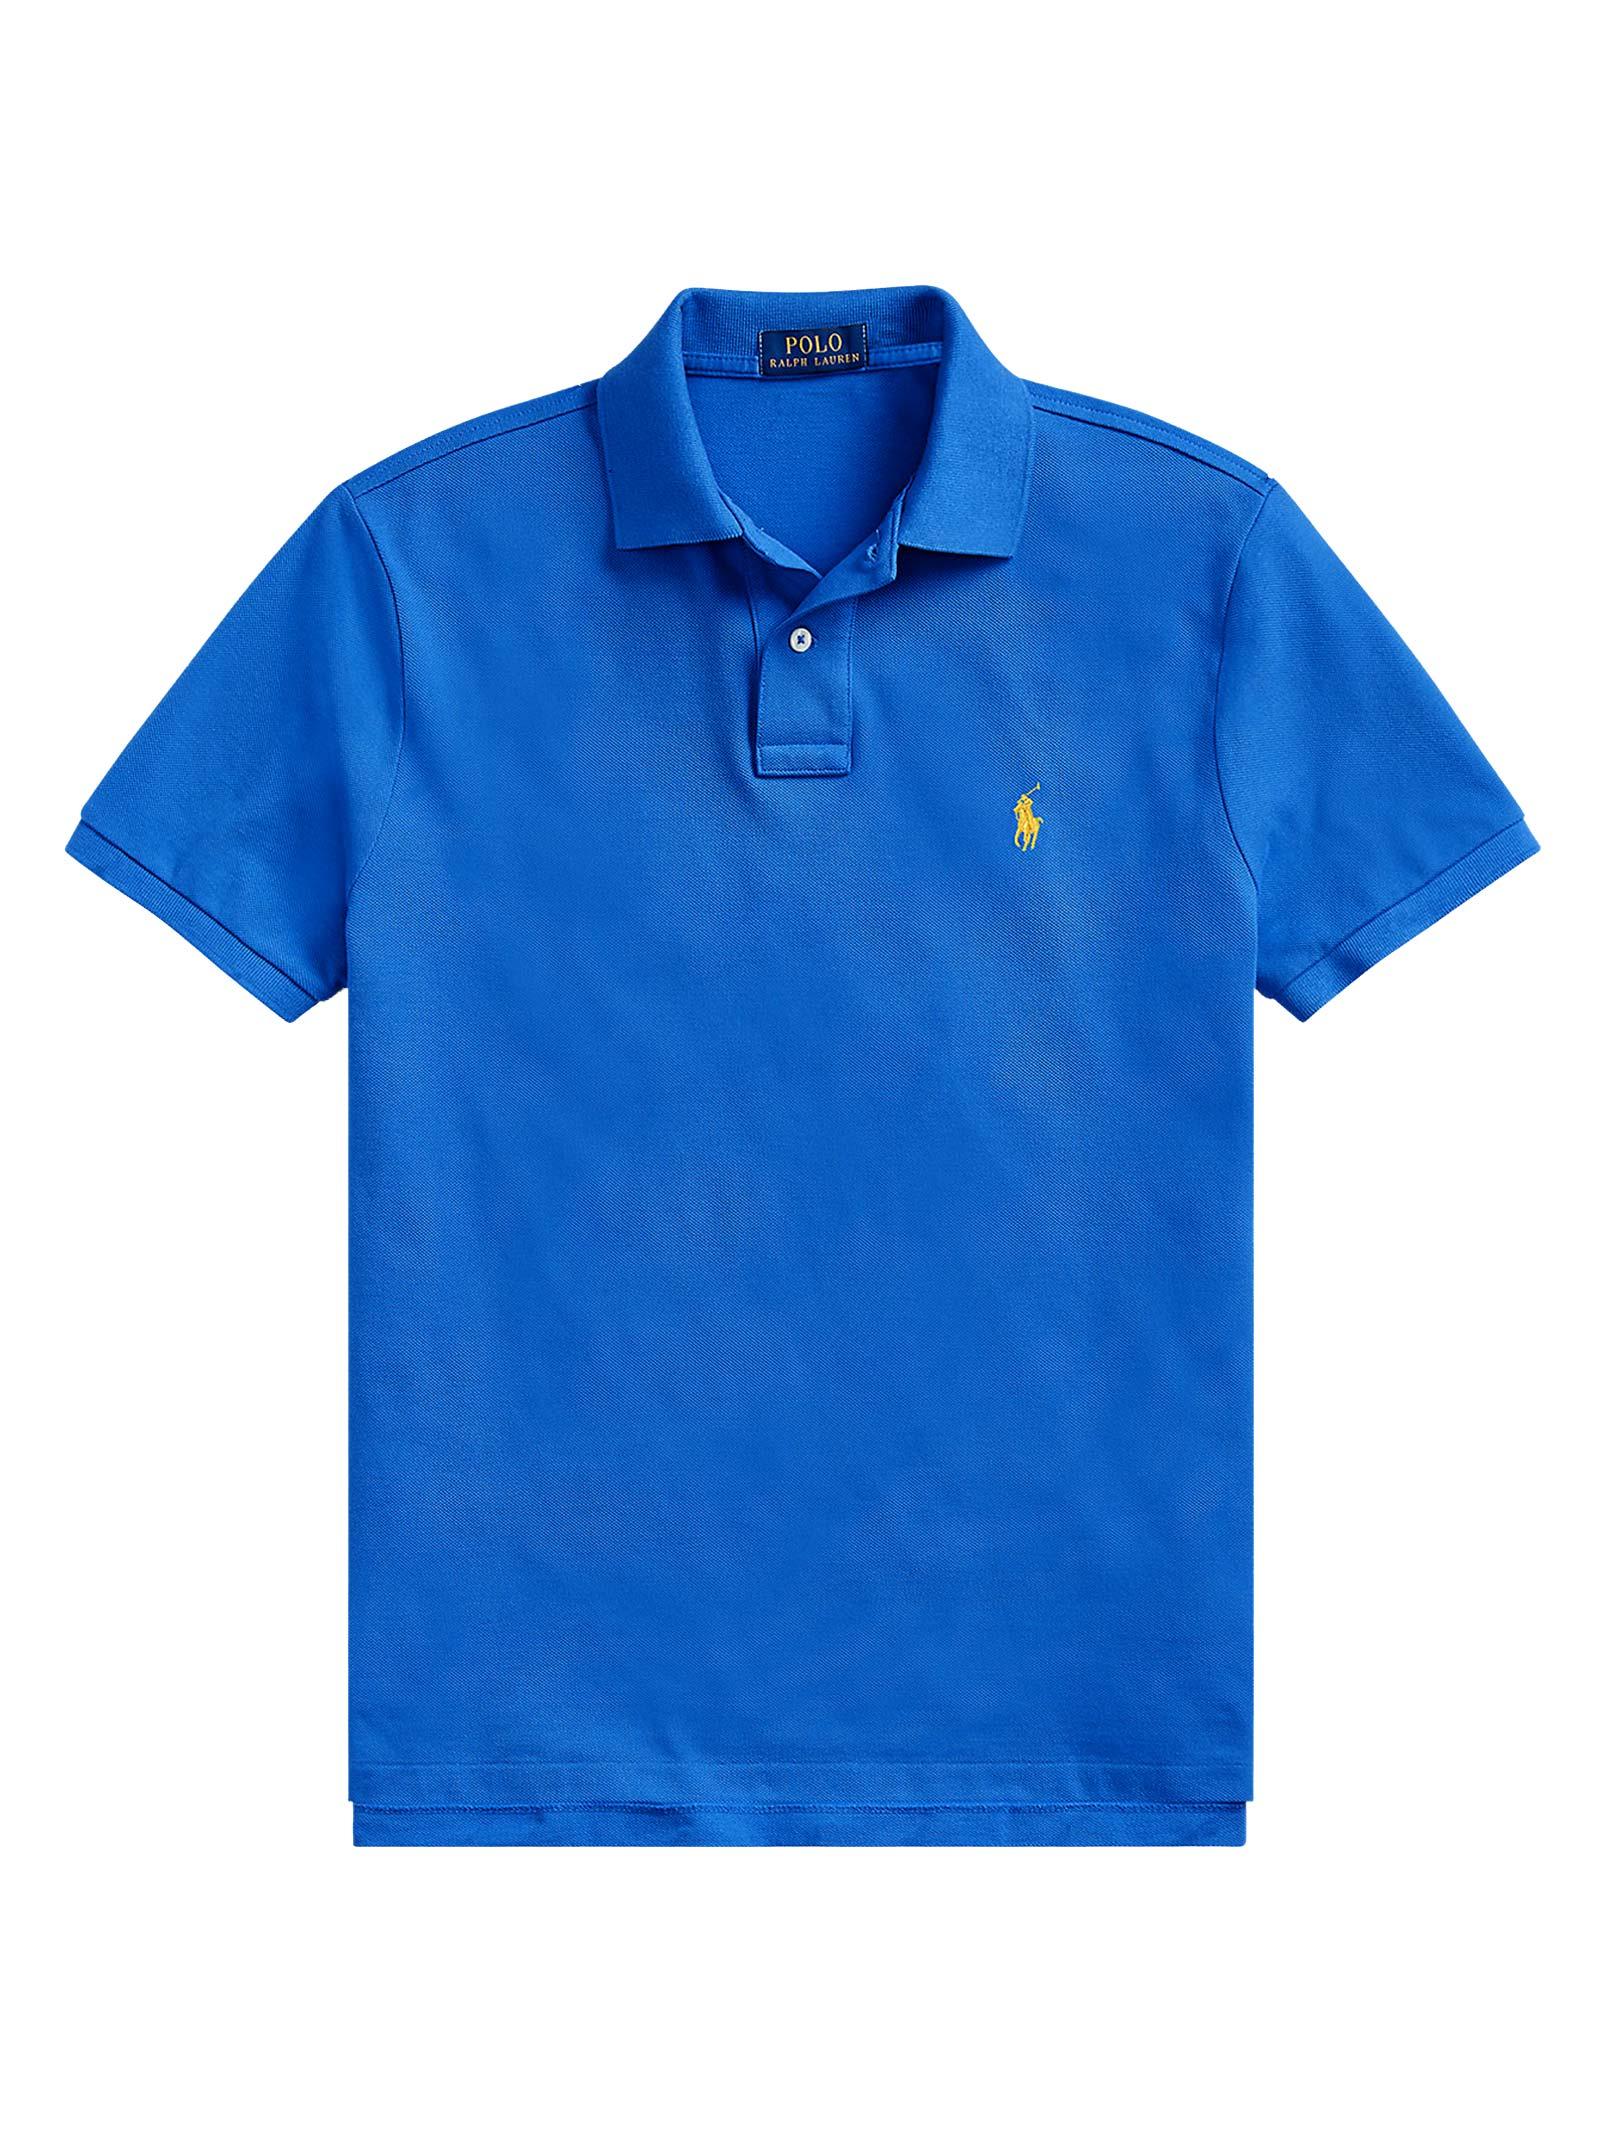 Polo regular in cotone blu RALPH LAUREN | Polo | 710-795080014